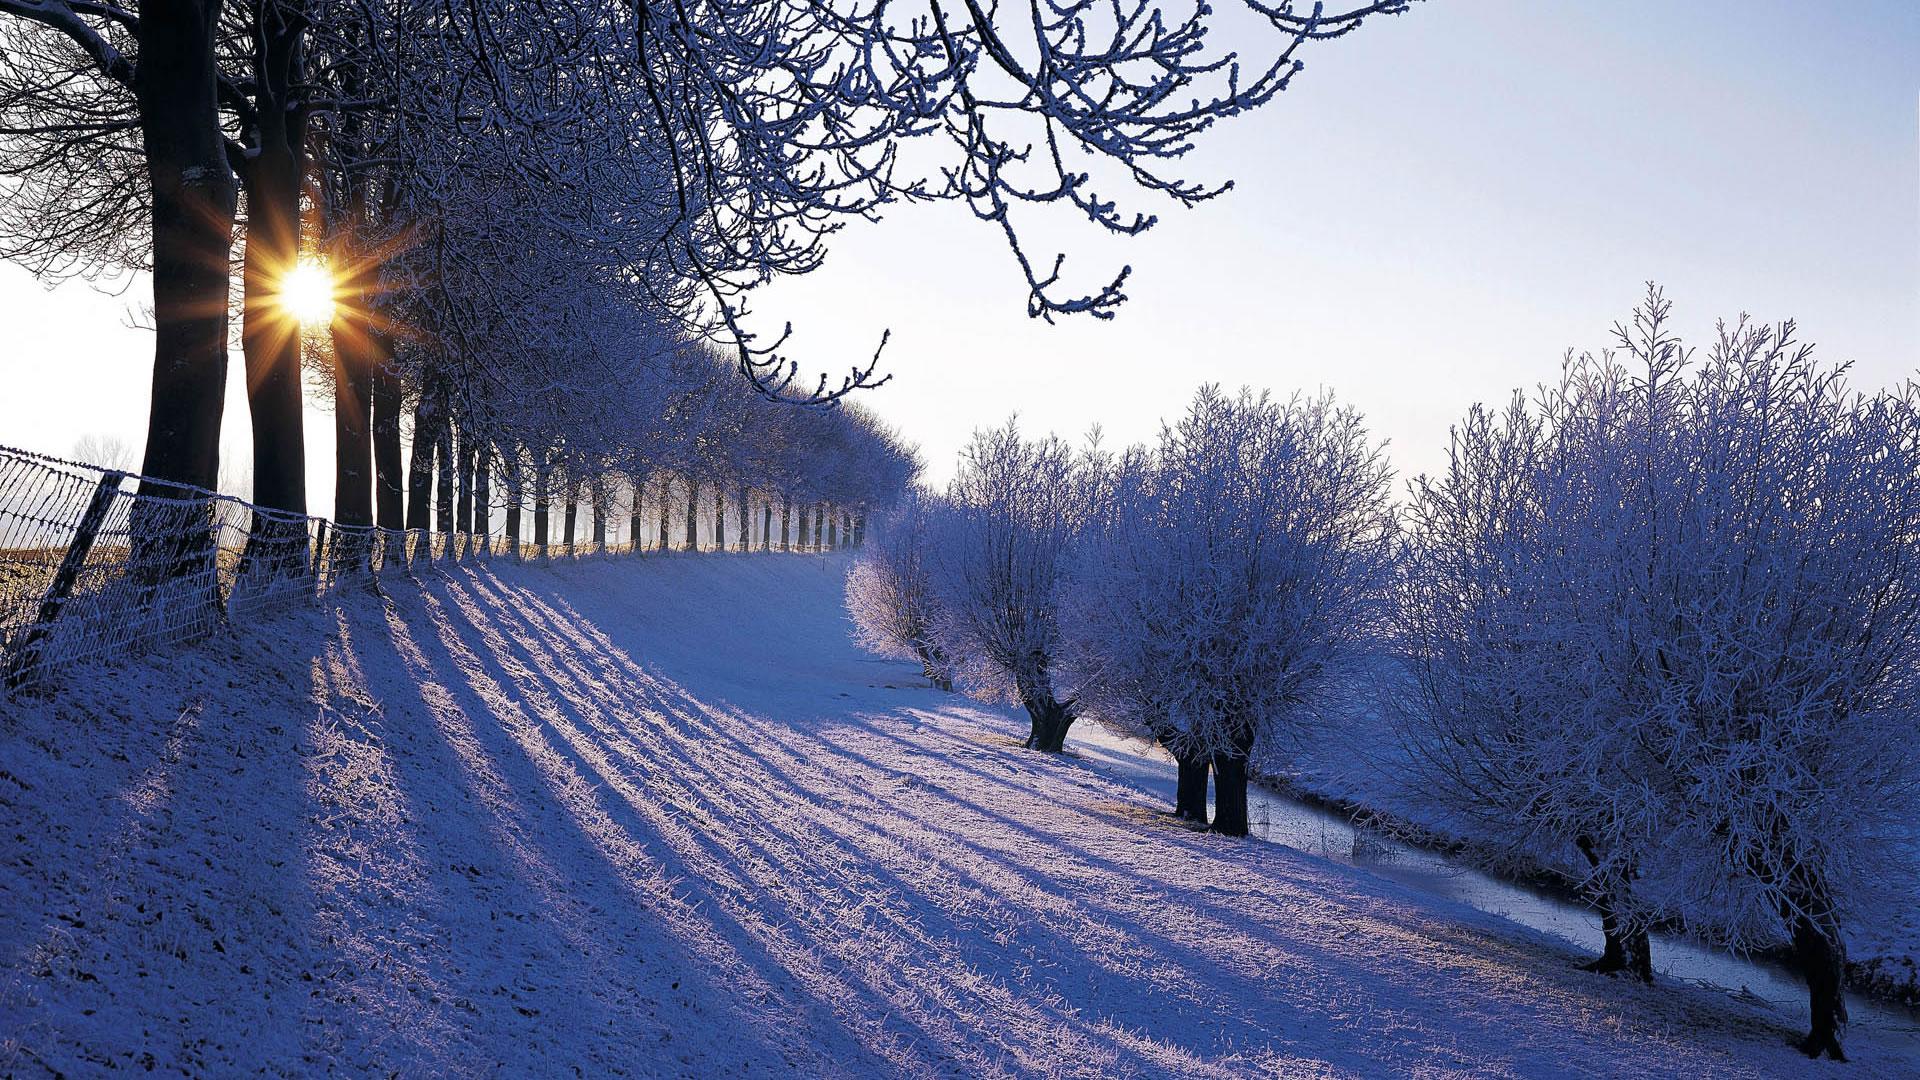 free desktop wallpaper winter which is under the winter wallpapers 1920x1080